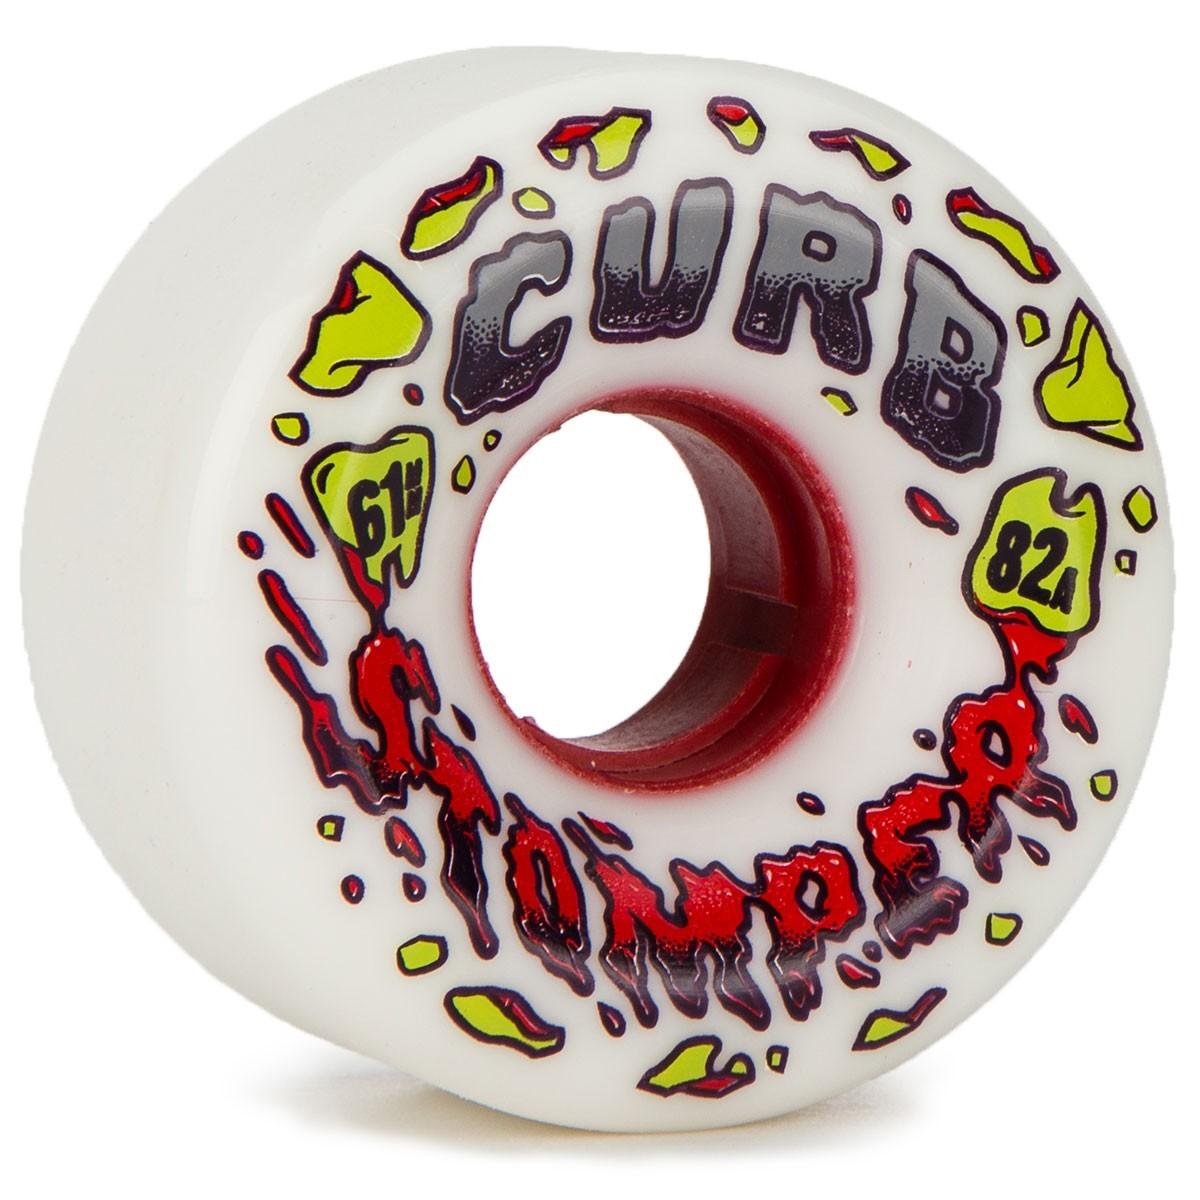 Venom Curb Stompers Wheels 61mm / 82a